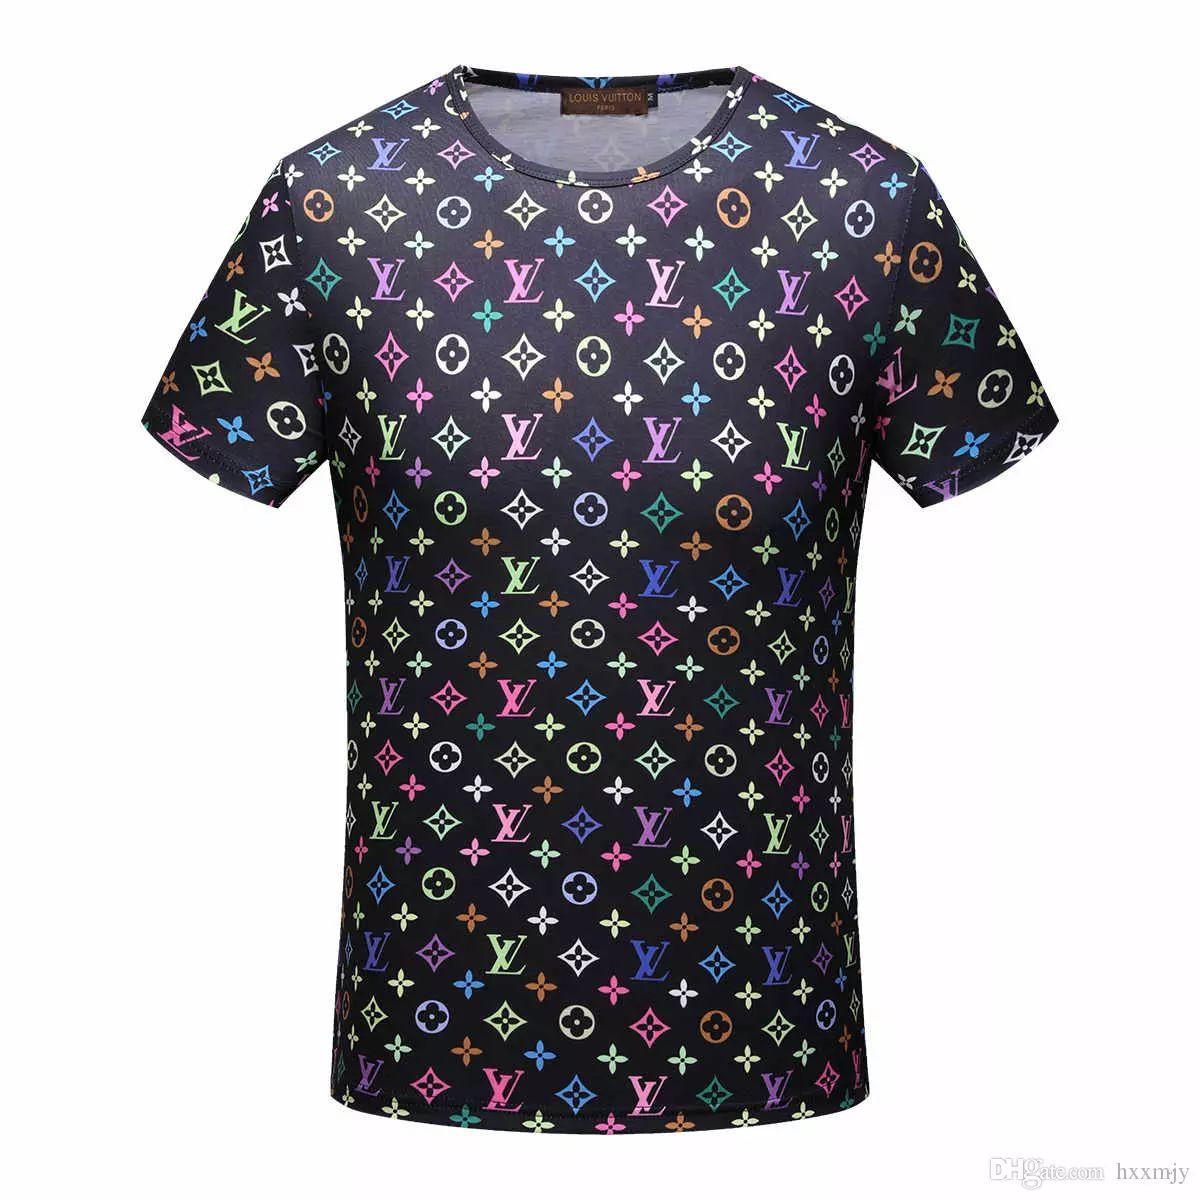 2018 Men Printed T Shirt Hot Sale Graphic Print Round Neck Short